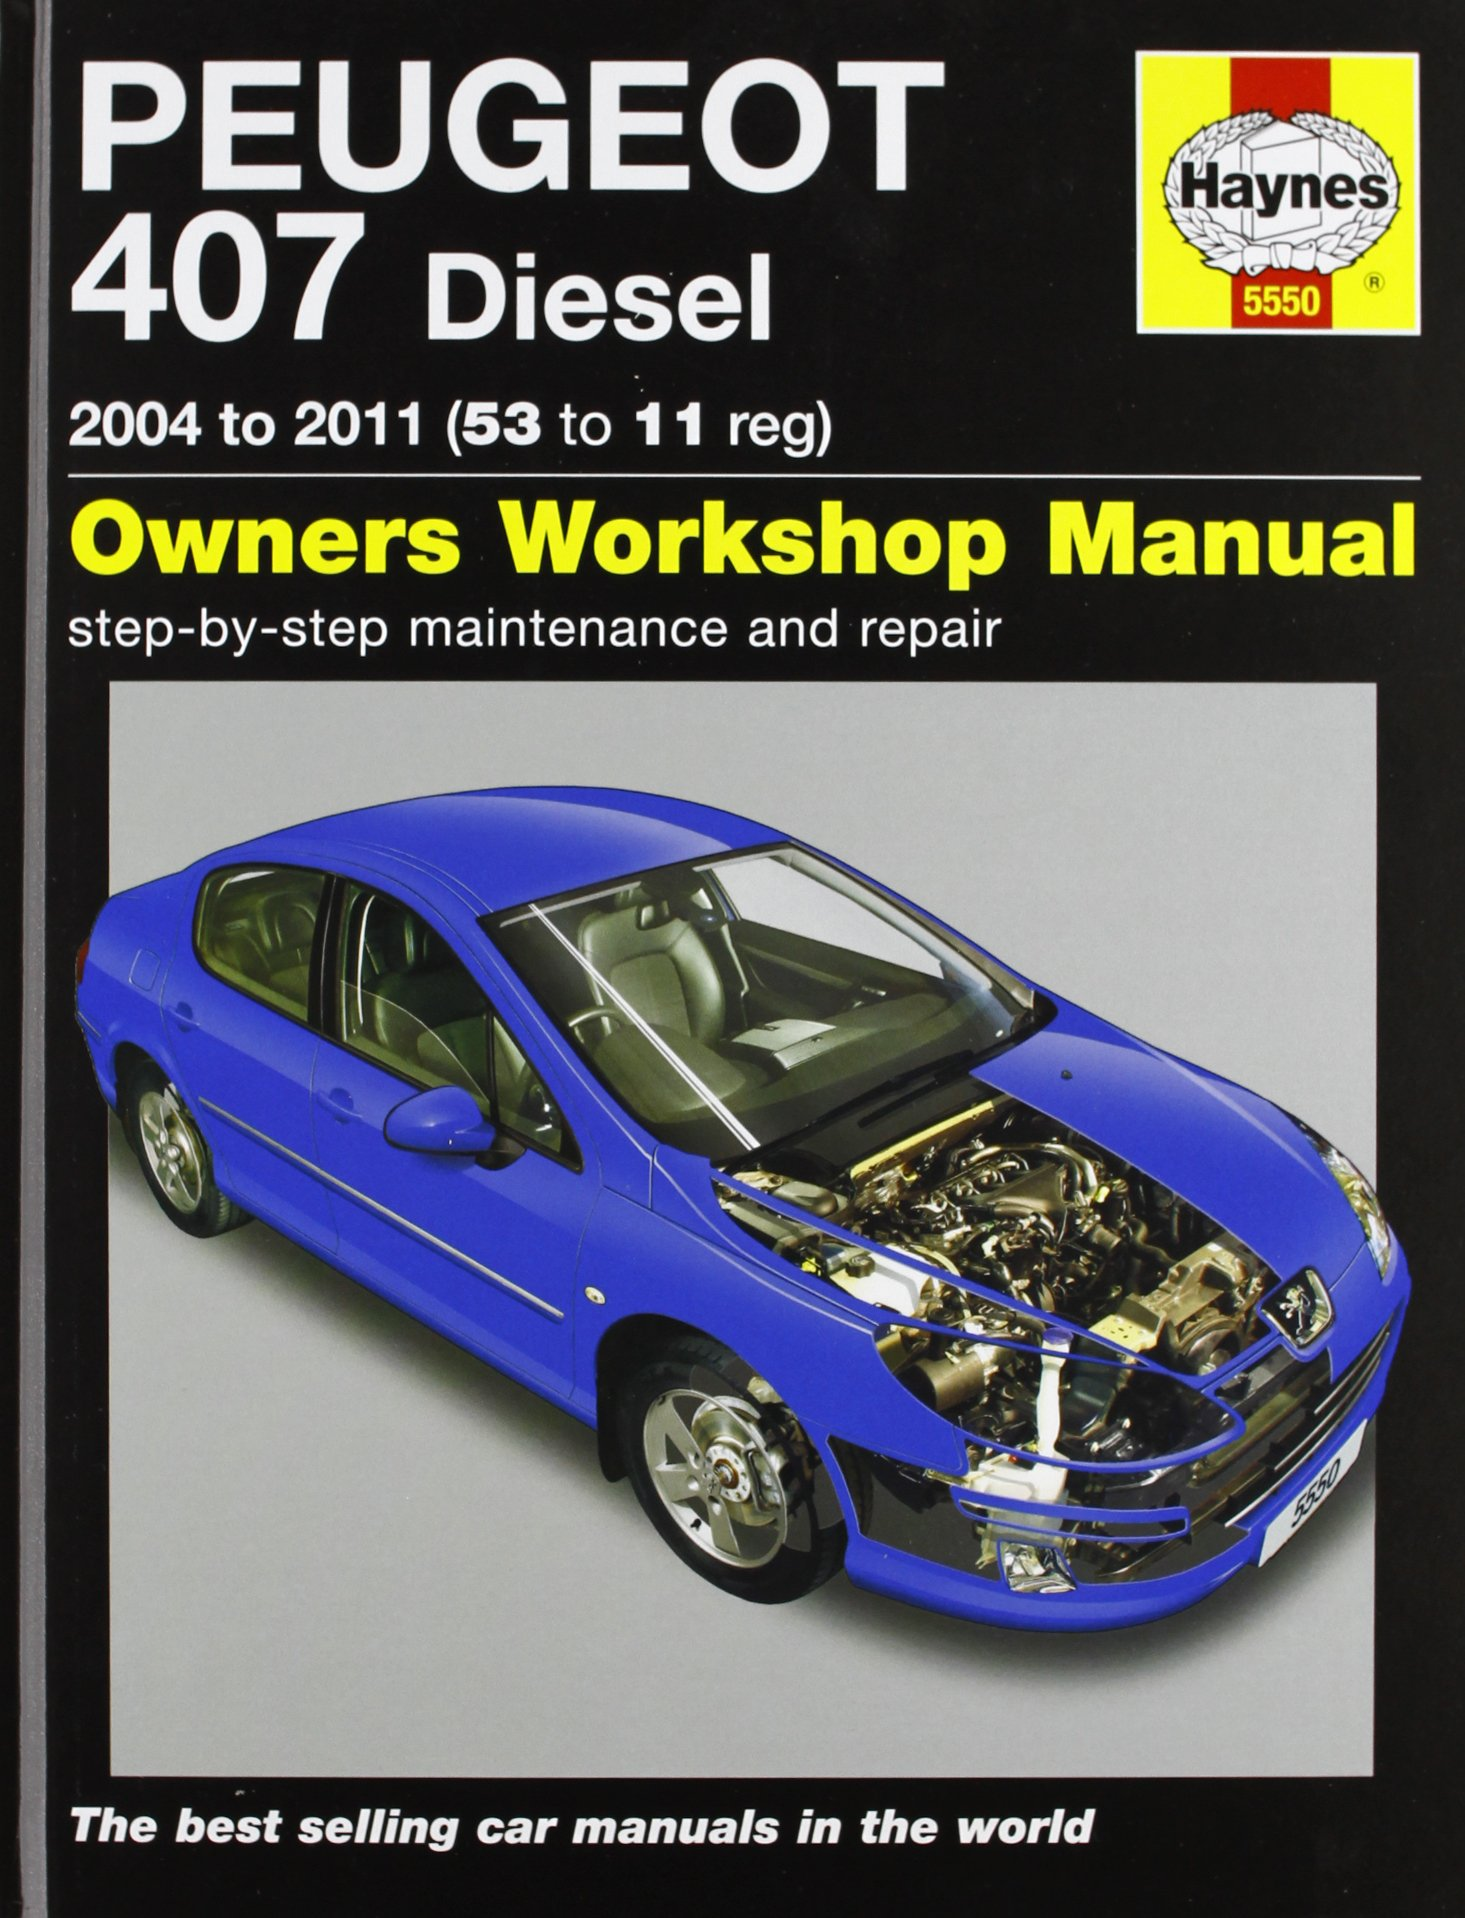 haynes manual 407 ebook rh haynes manual 407 ebook logoutev de Peugeot 208 Interior Manual service manual peugeot 207 cc